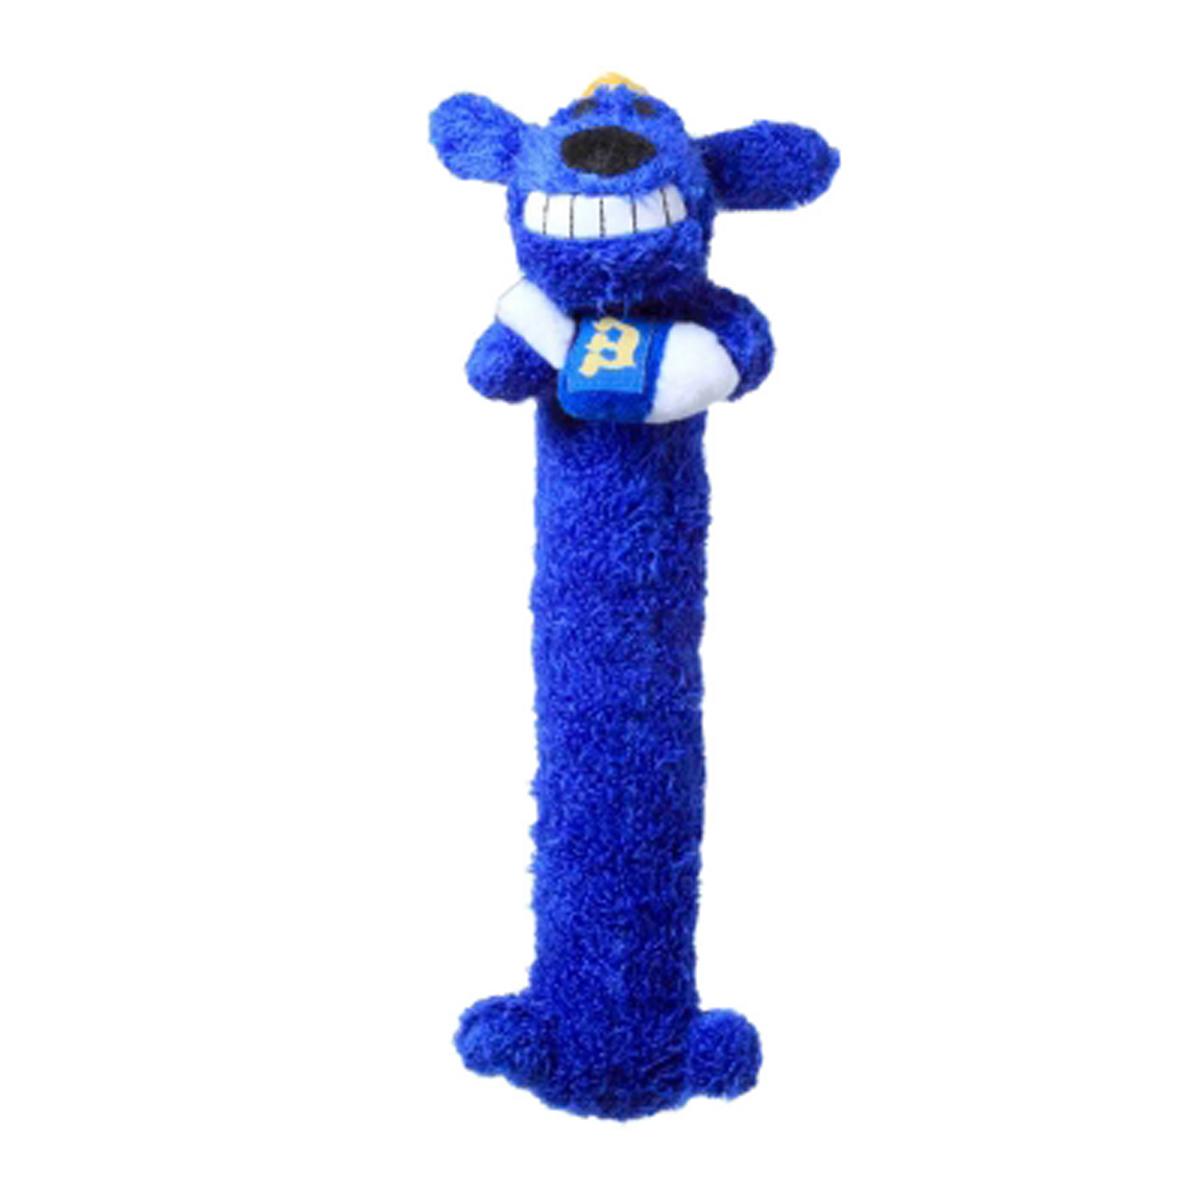 Loofa Hanukkah Dog Toy - Blue